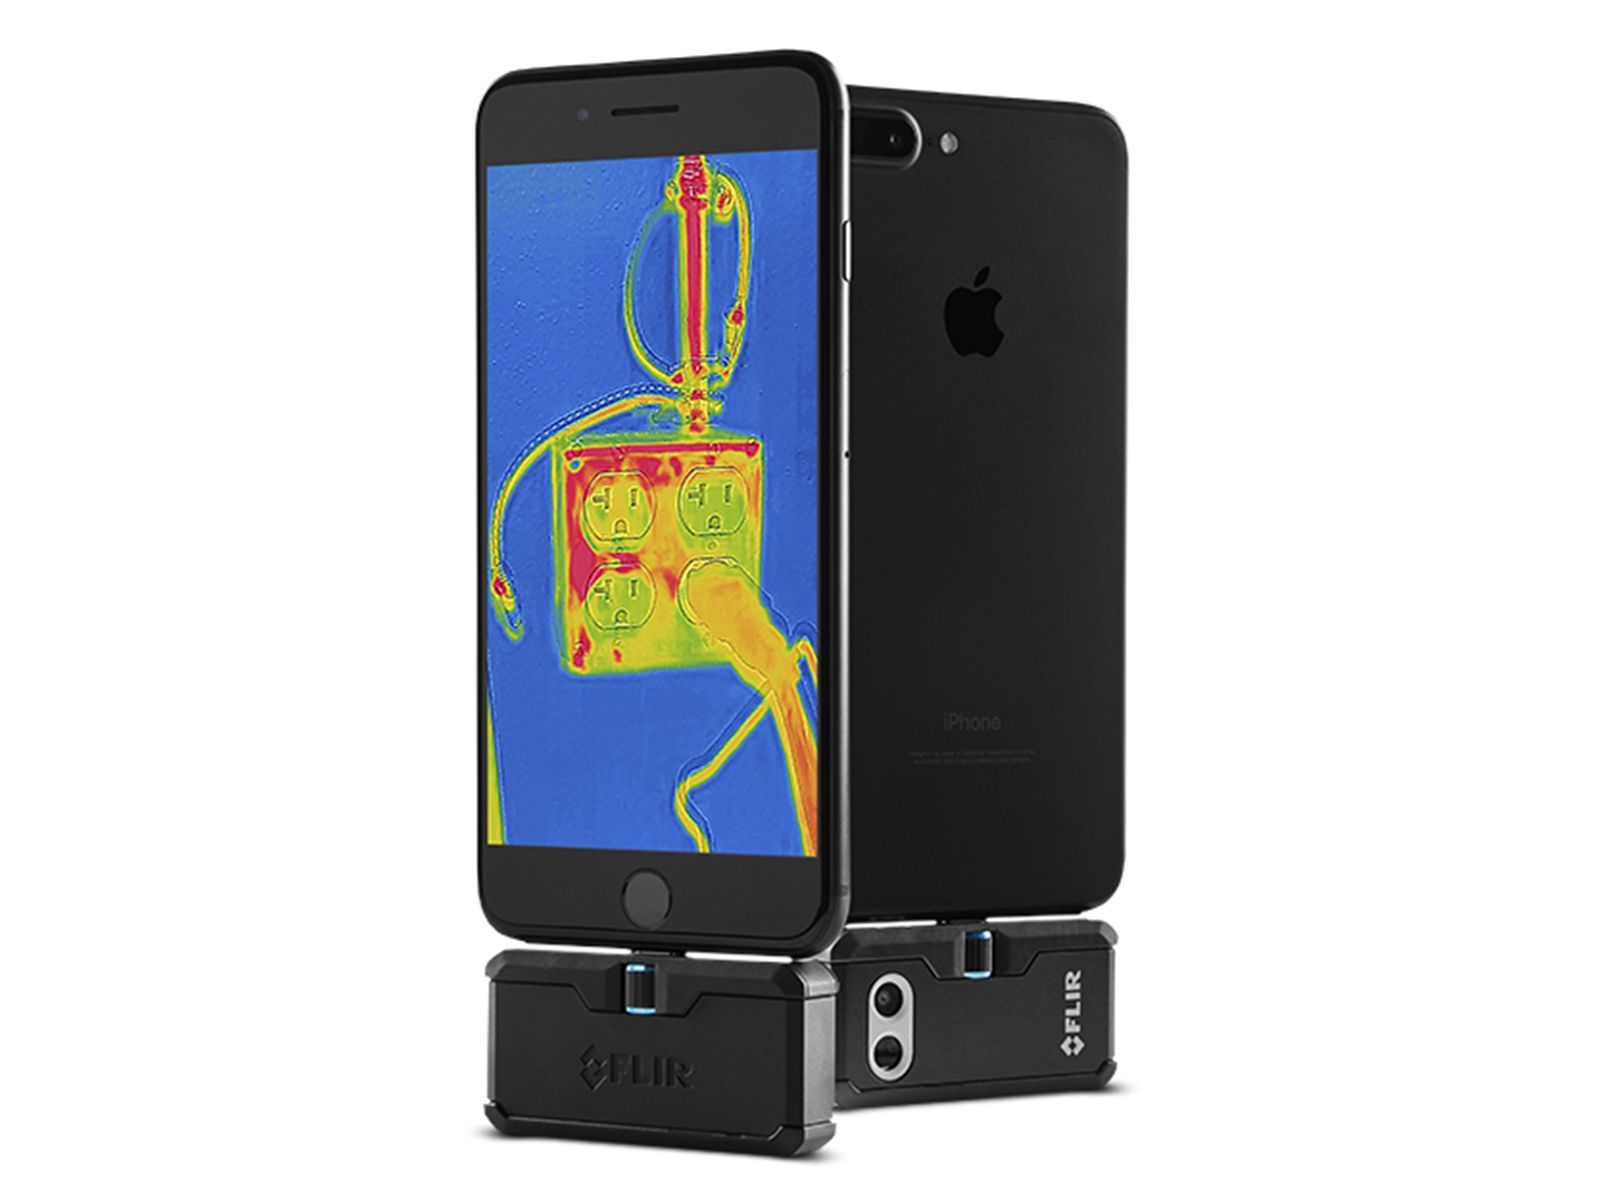 FLIR ONE Wärmebildkameras für Smartphones